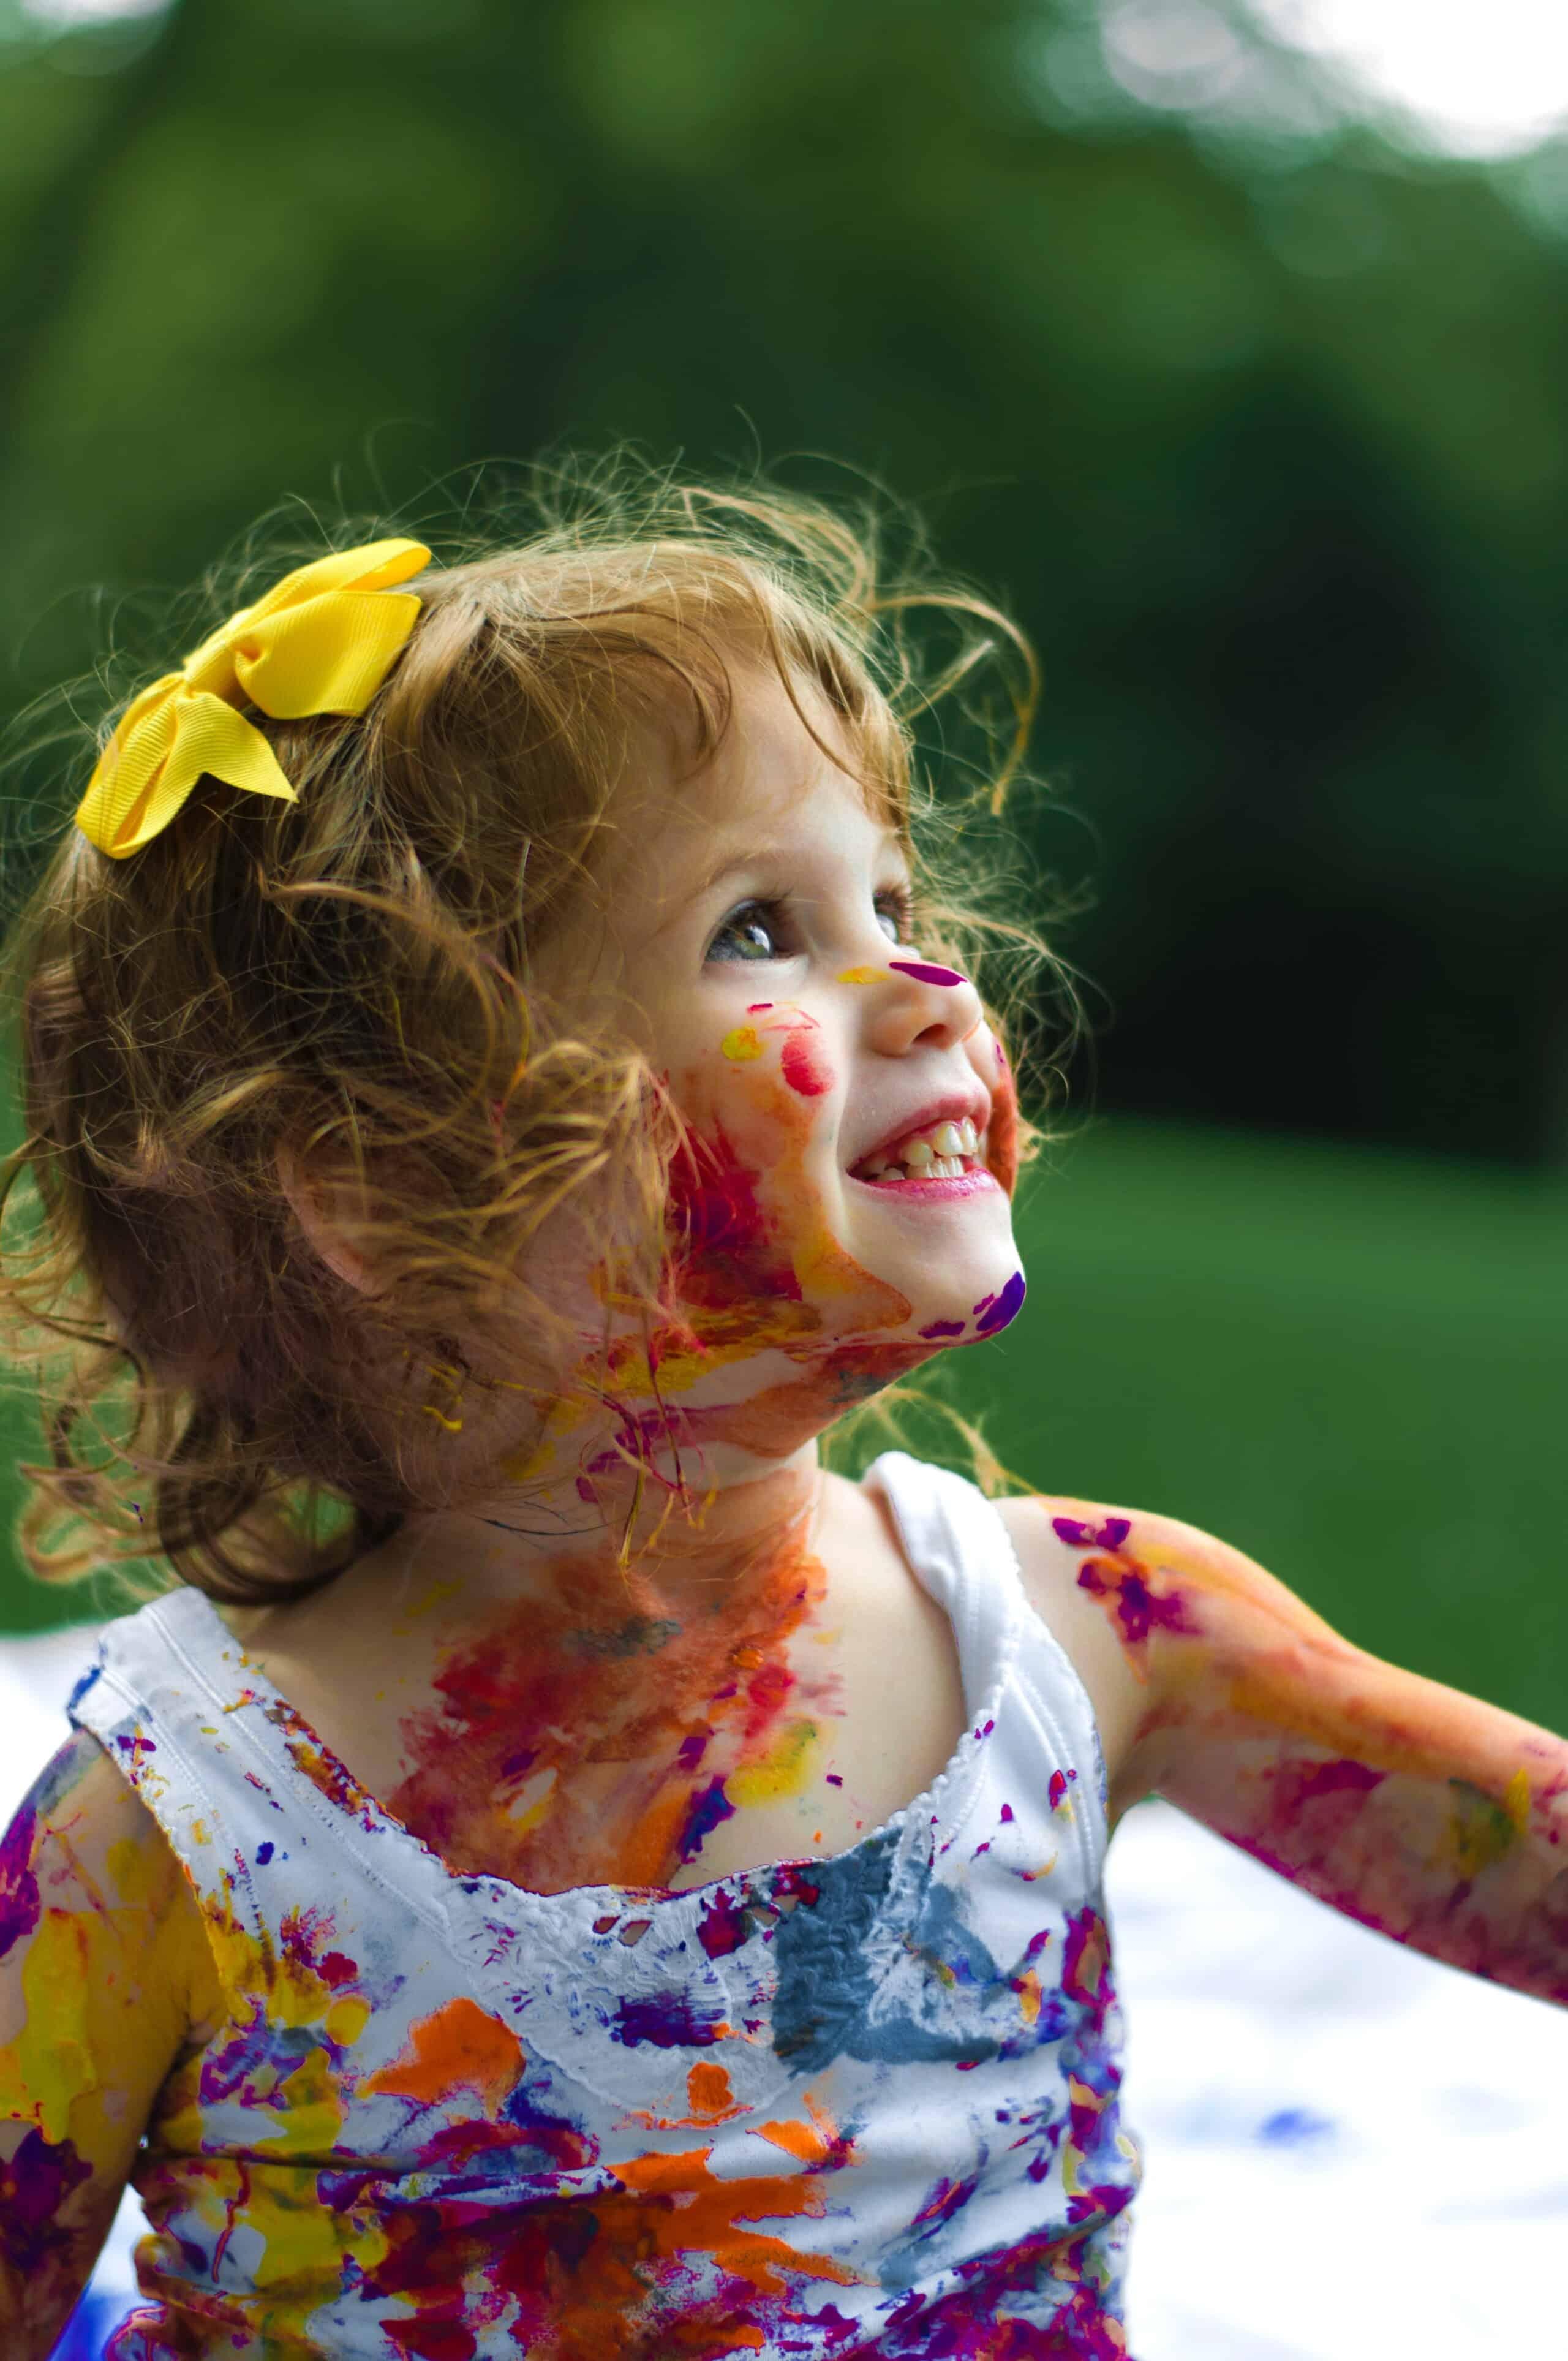 Etapele dezvoltarii emotionale la copii in functie de varsta - psihoterapeut Isabela Mihut | Demamici.ro